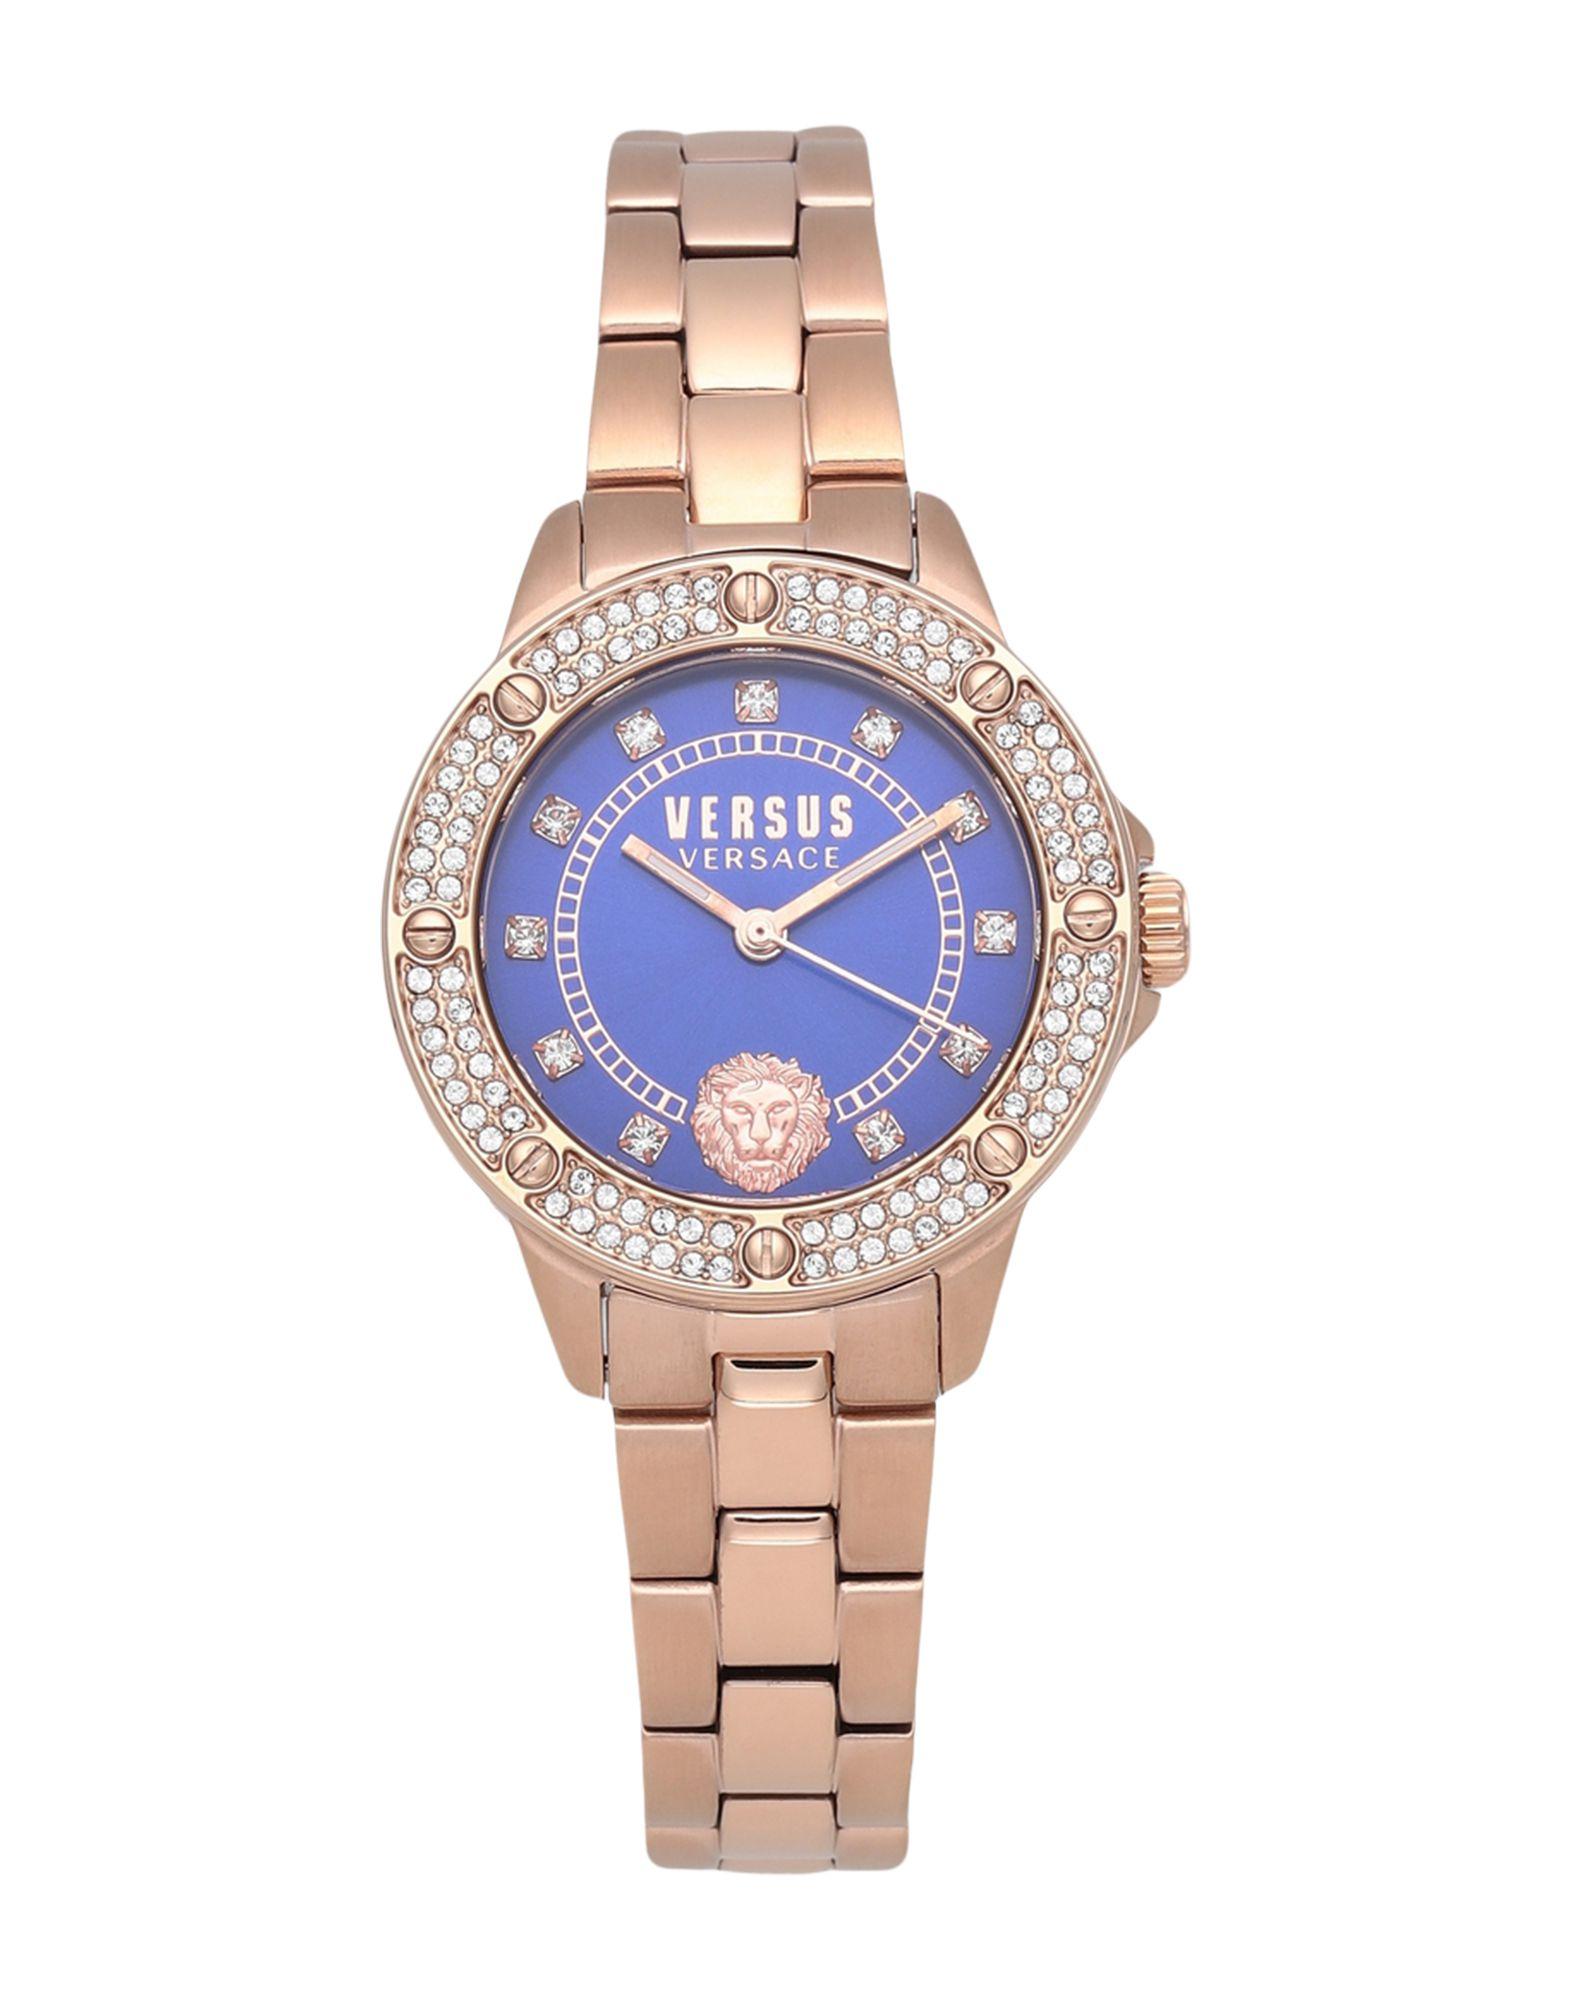 VERSUS VERSACE Wrist watches - Item 58049354